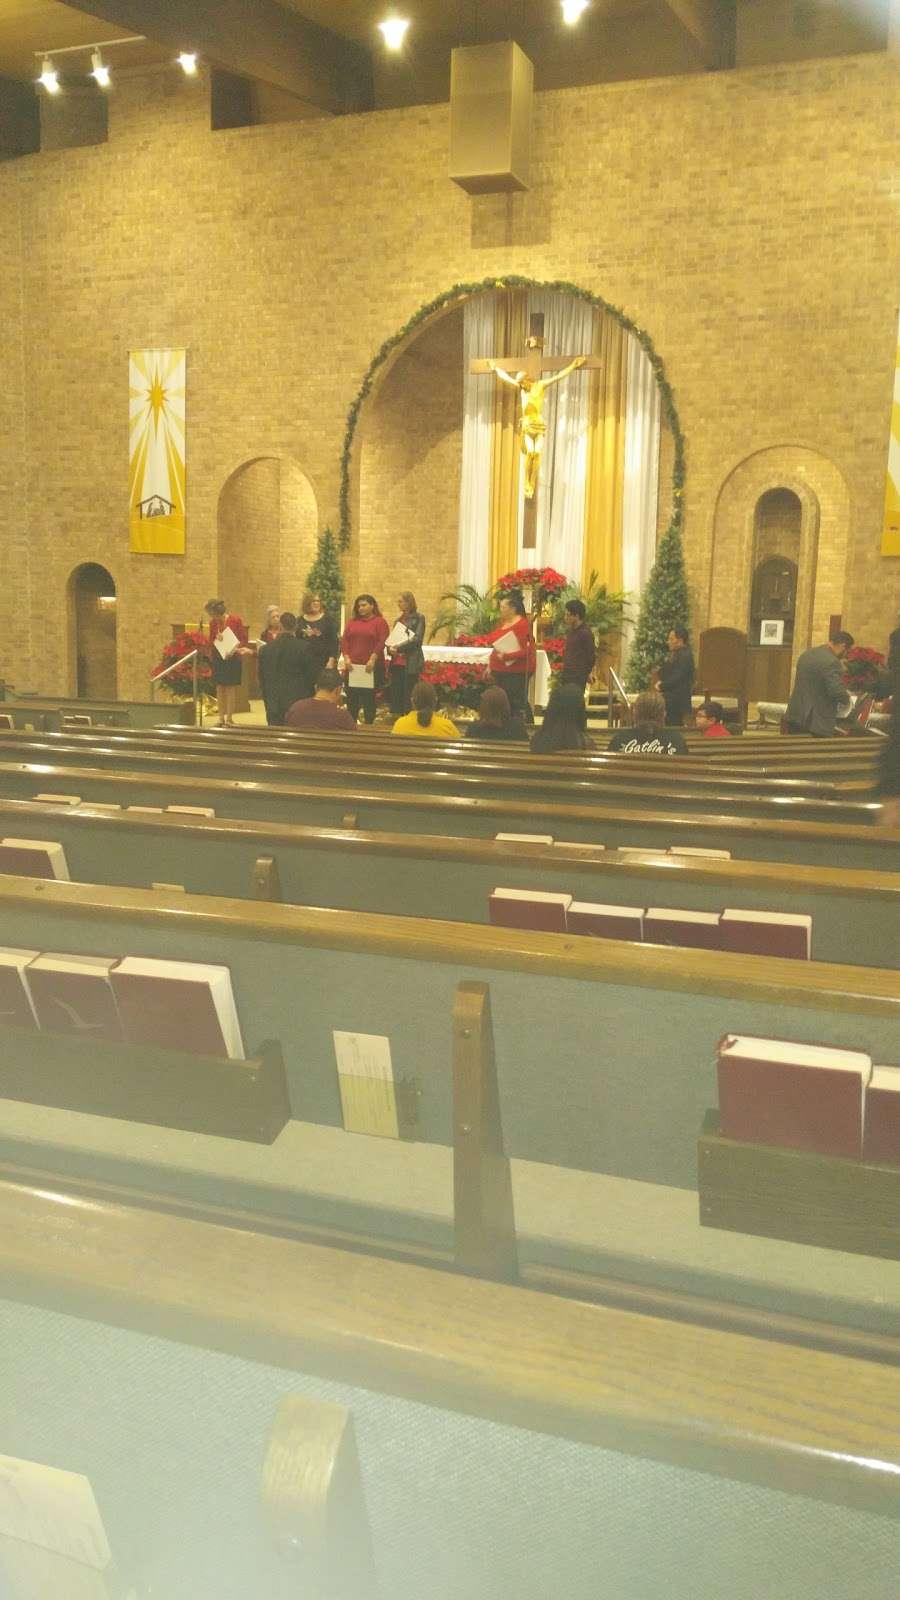 St. Matthew the Evangelist Catholic Church - church  | Photo 7 of 10 | Address: 9915 Hollister St, Houston, TX 77040, USA | Phone: (713) 466-4030